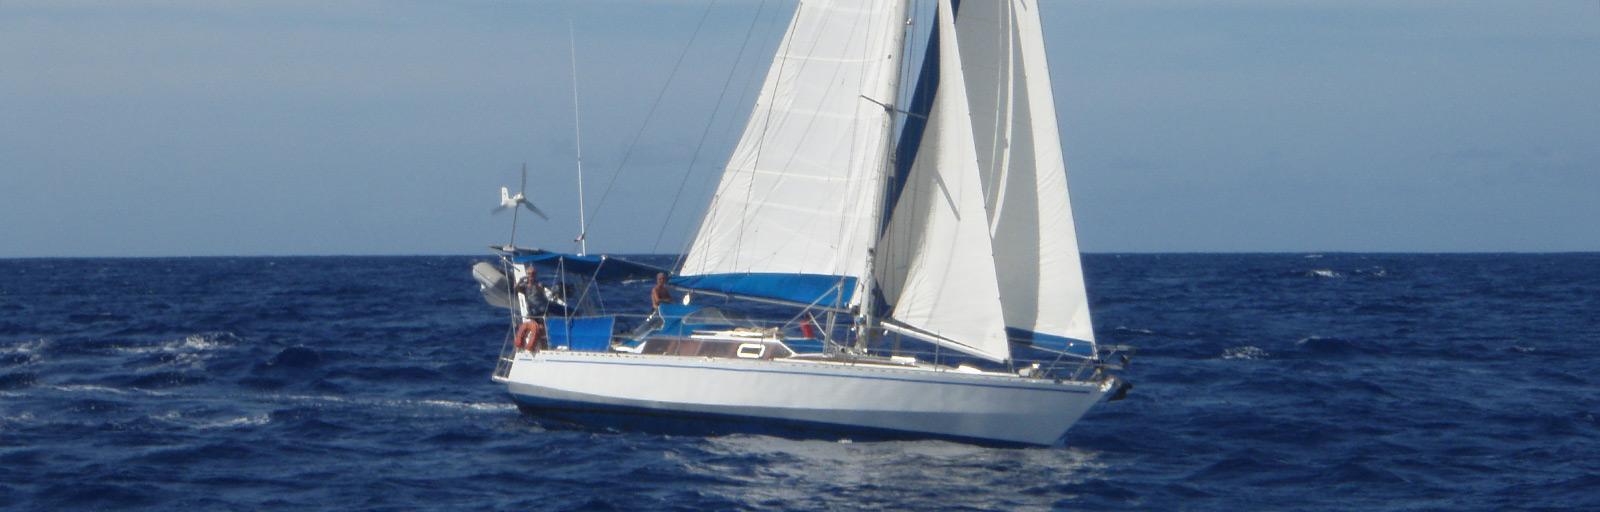 Gael 43 - AYC Yachtbroker